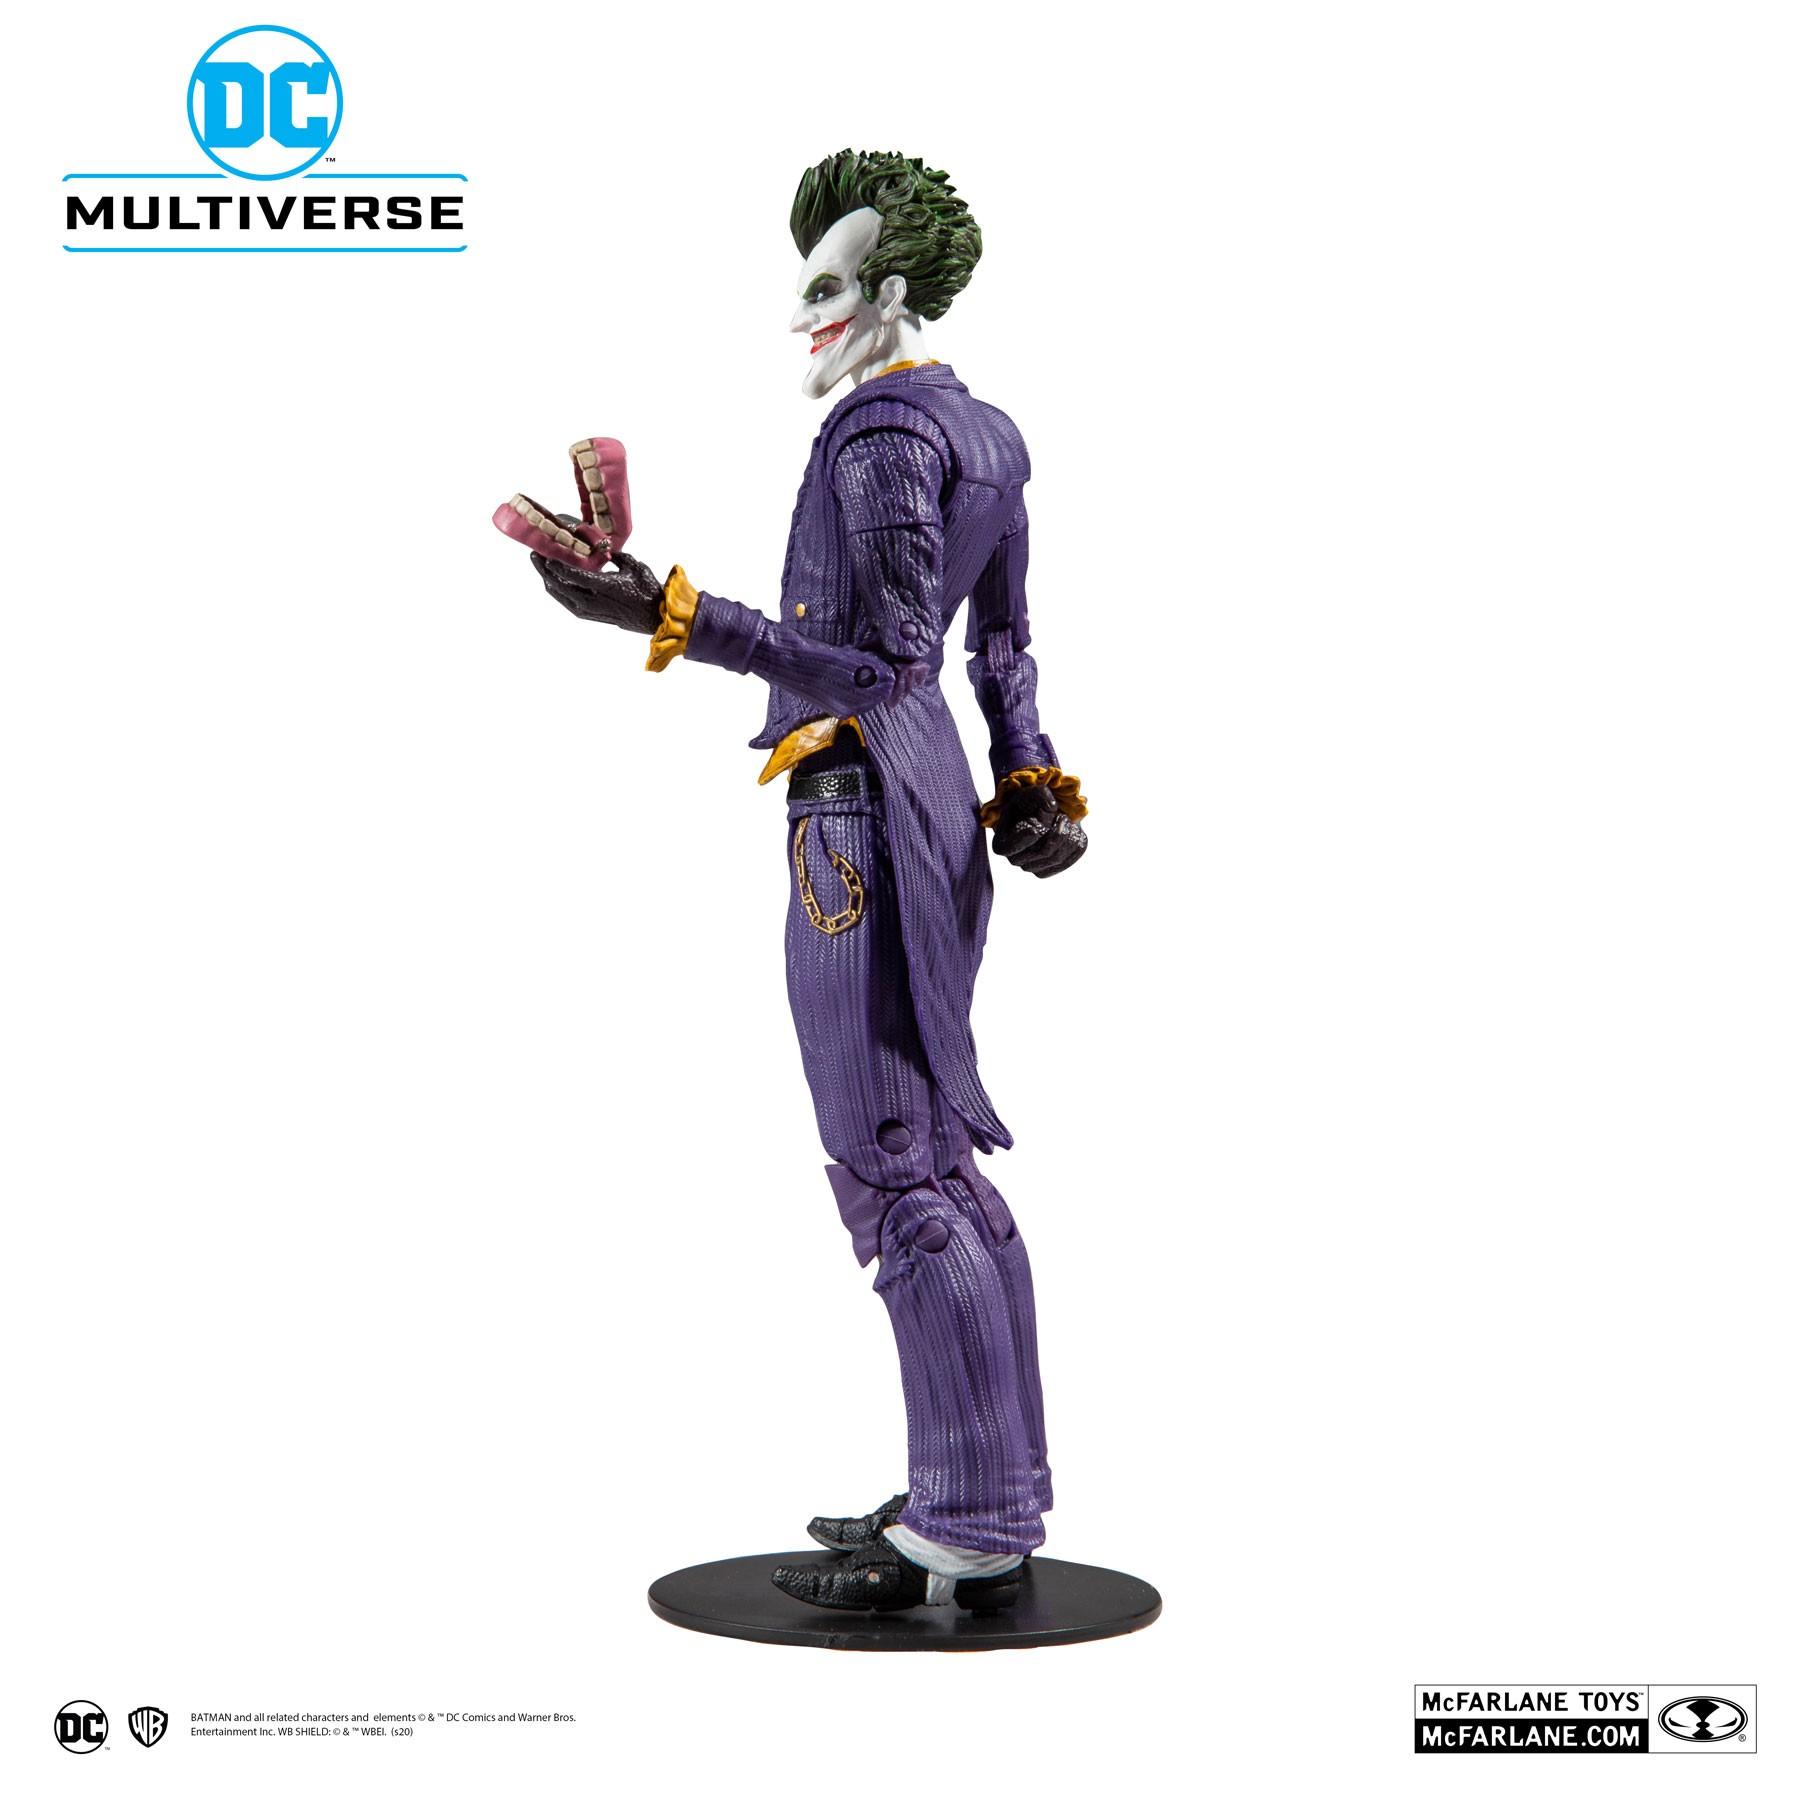 Action Figure Coringa (The Joker): Batman Arkham Asylum (DC Multiverse) - McFarlane Toys